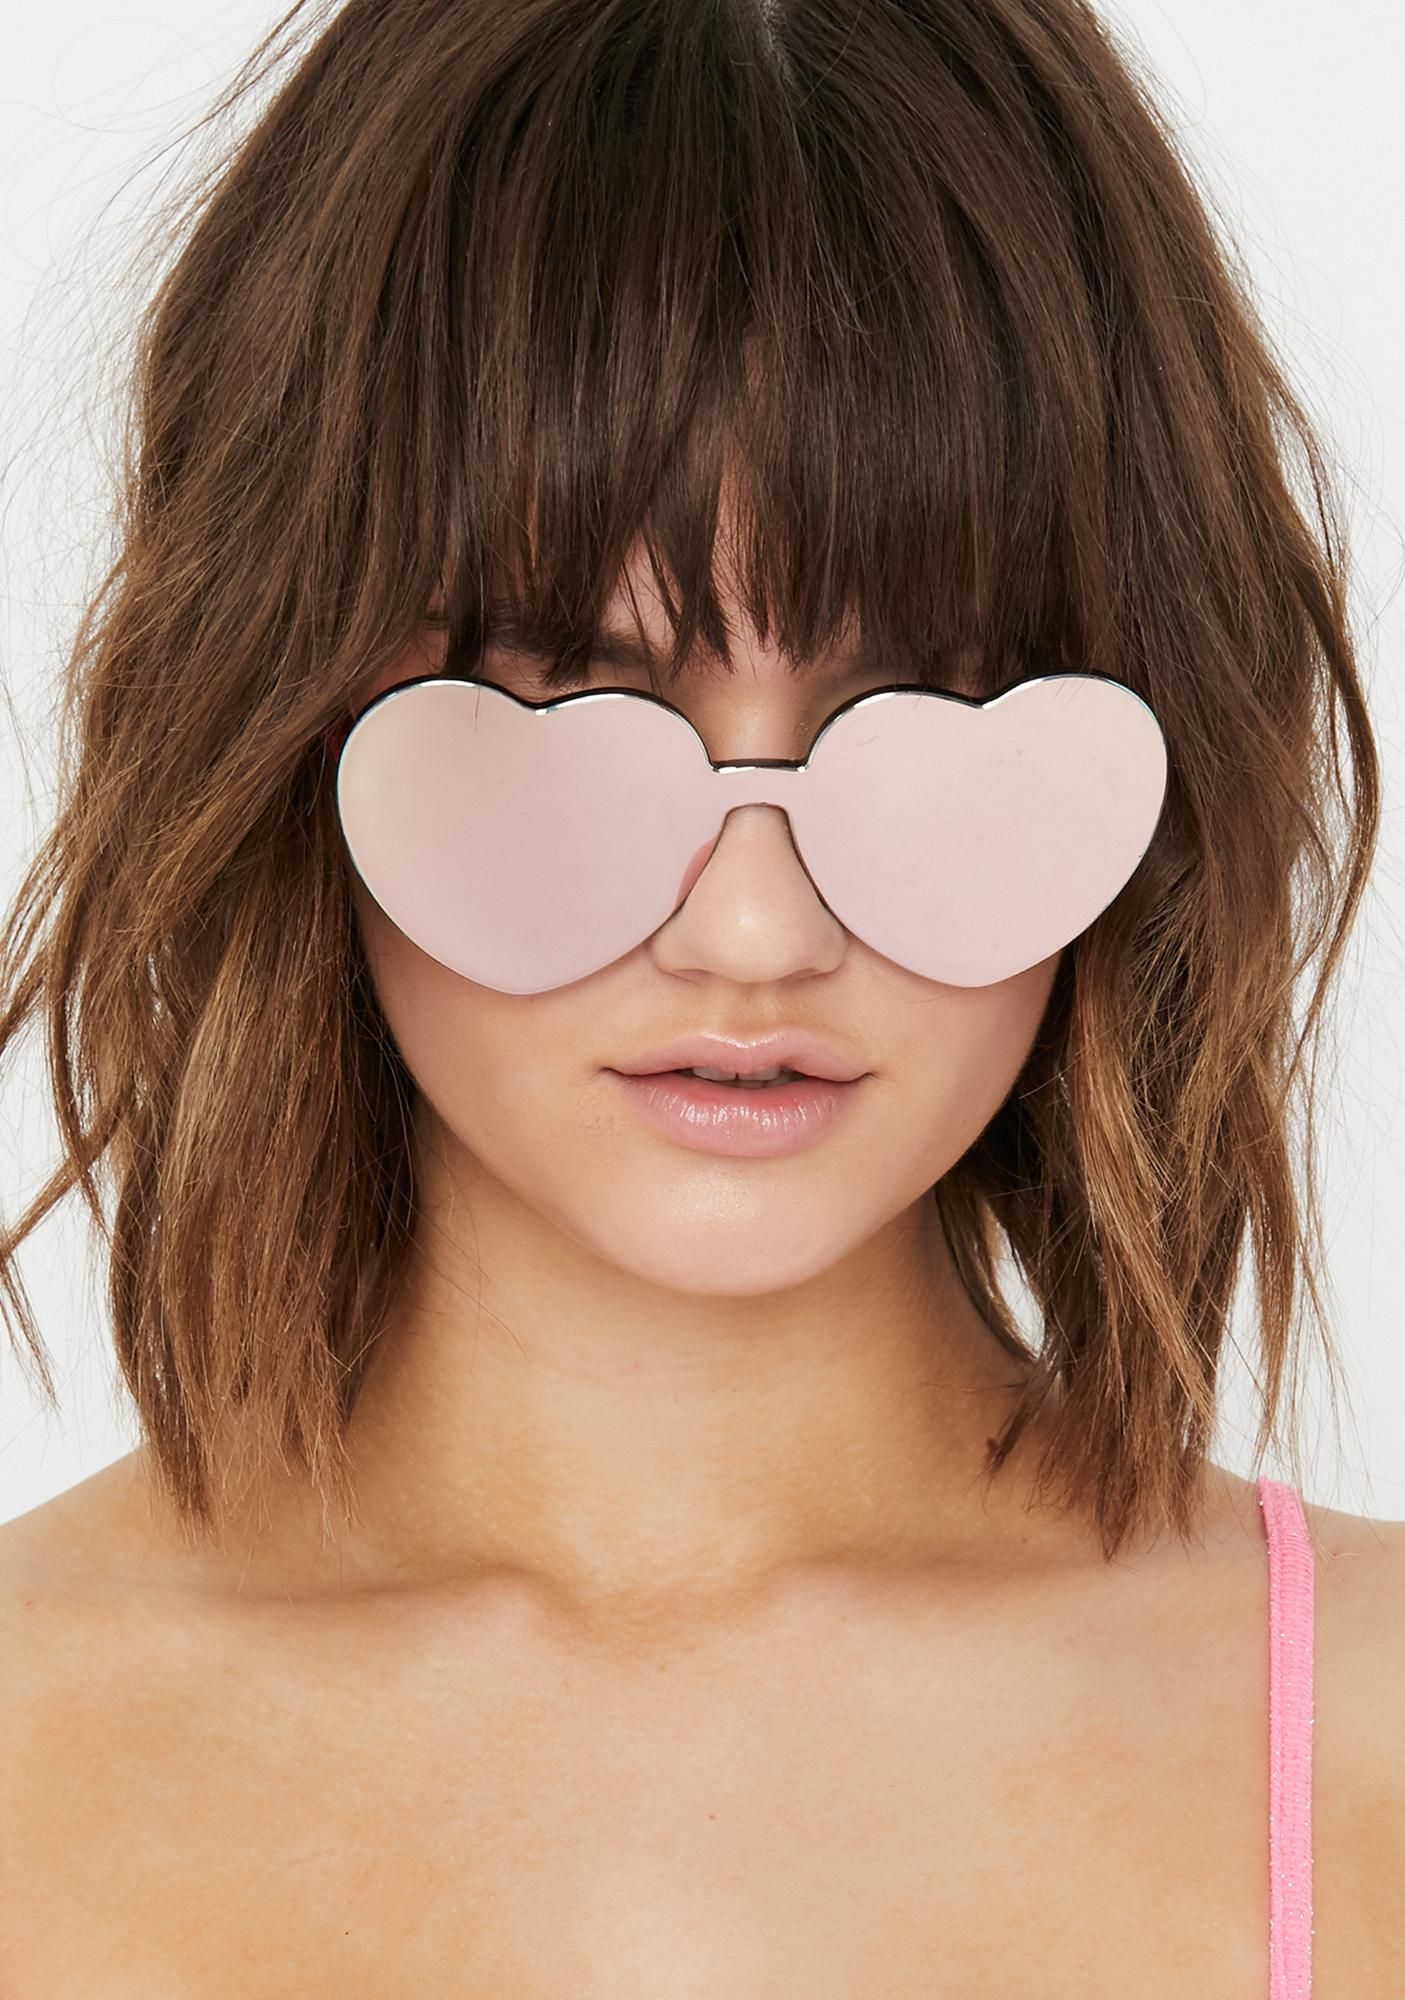 peach diet dew heart sunglasses